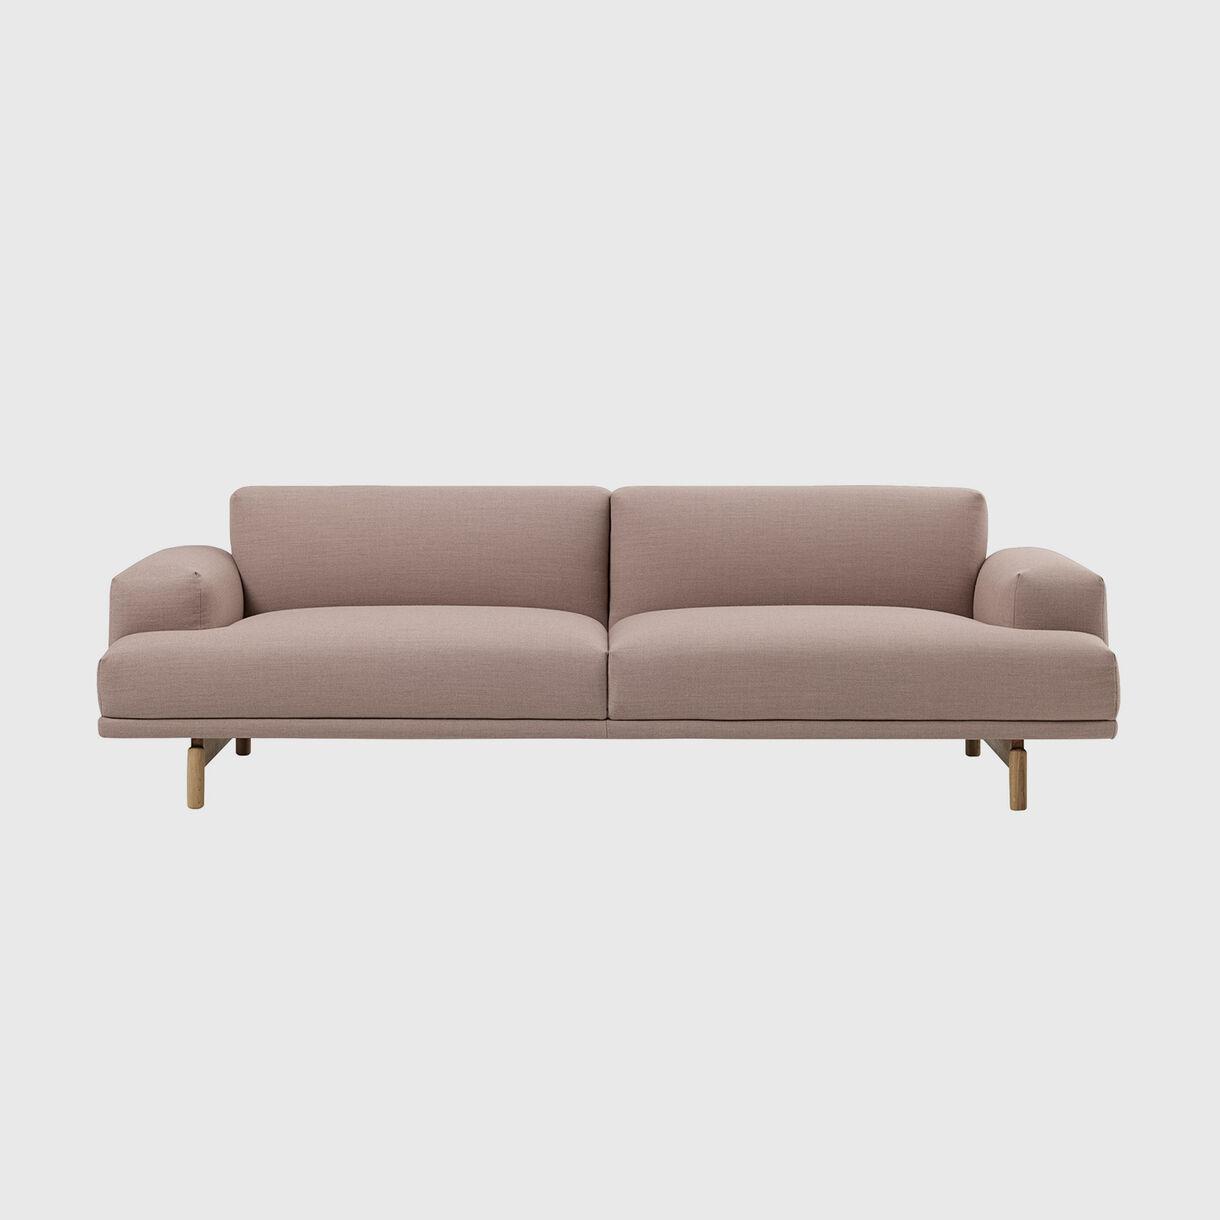 Compose Sofa, 3 Seater, Fiord 551